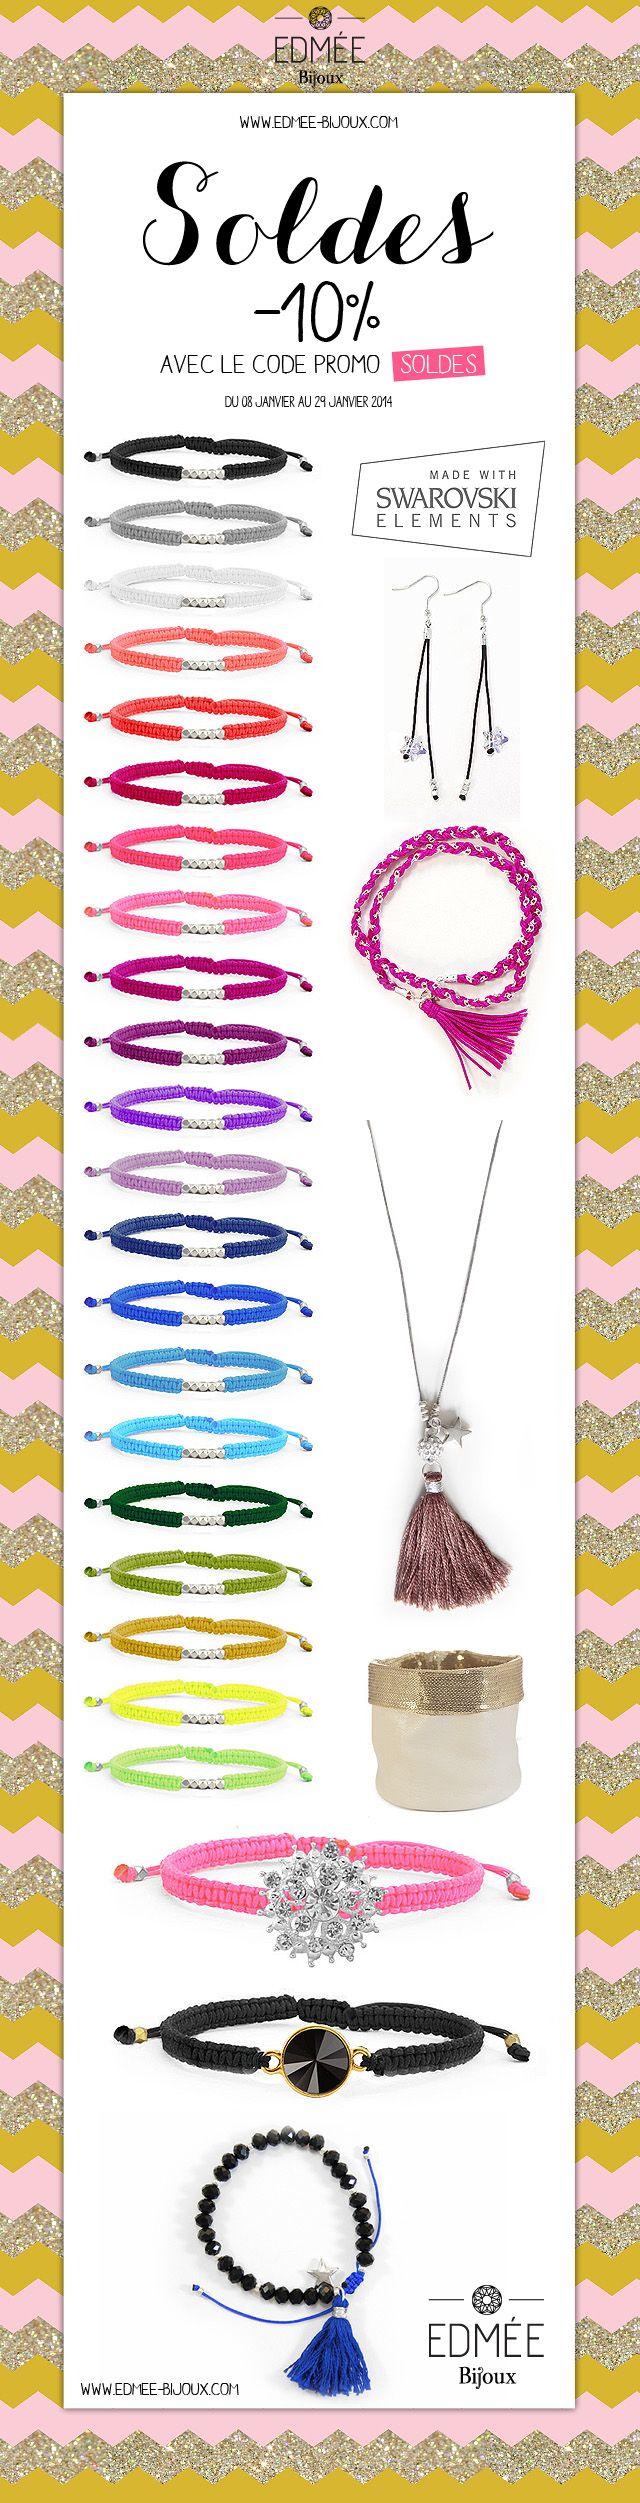 #soldes #sales www.edmee-bijoux.com #bracelet #necklace #earrings #ring #jewellery #jewels #swarovski #friendship #shamballa